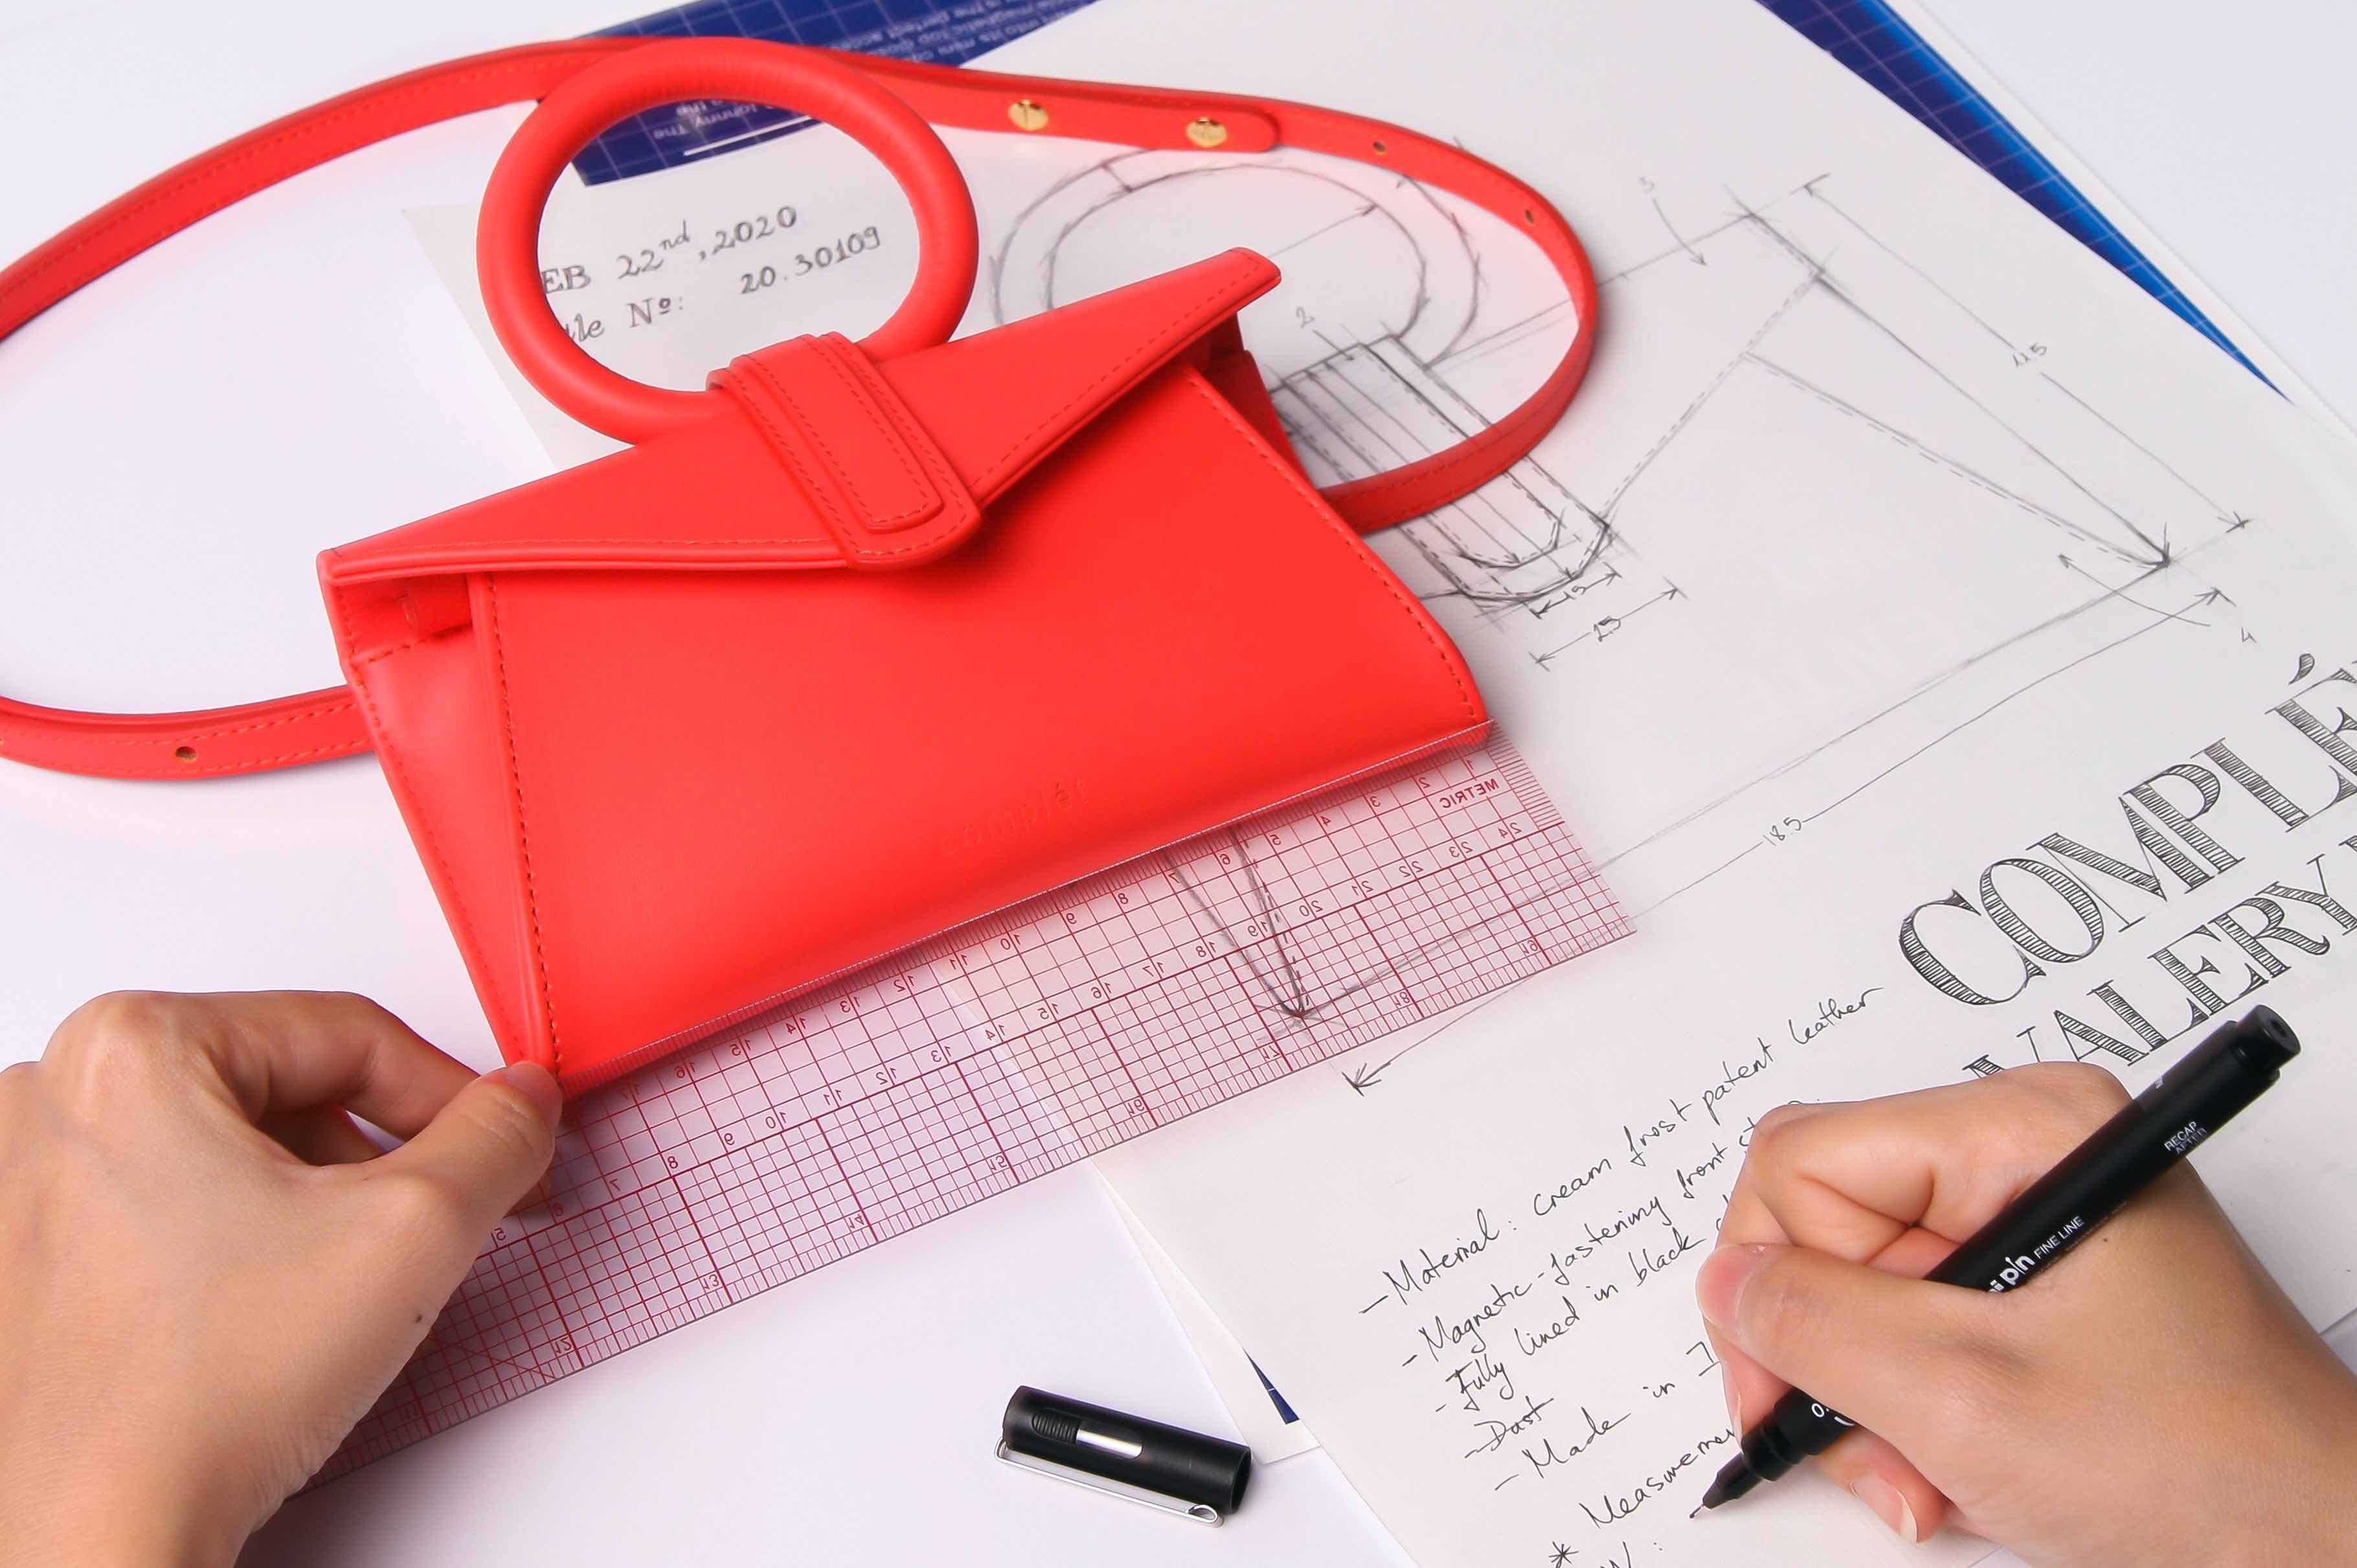 Handbag designer sketching a bag